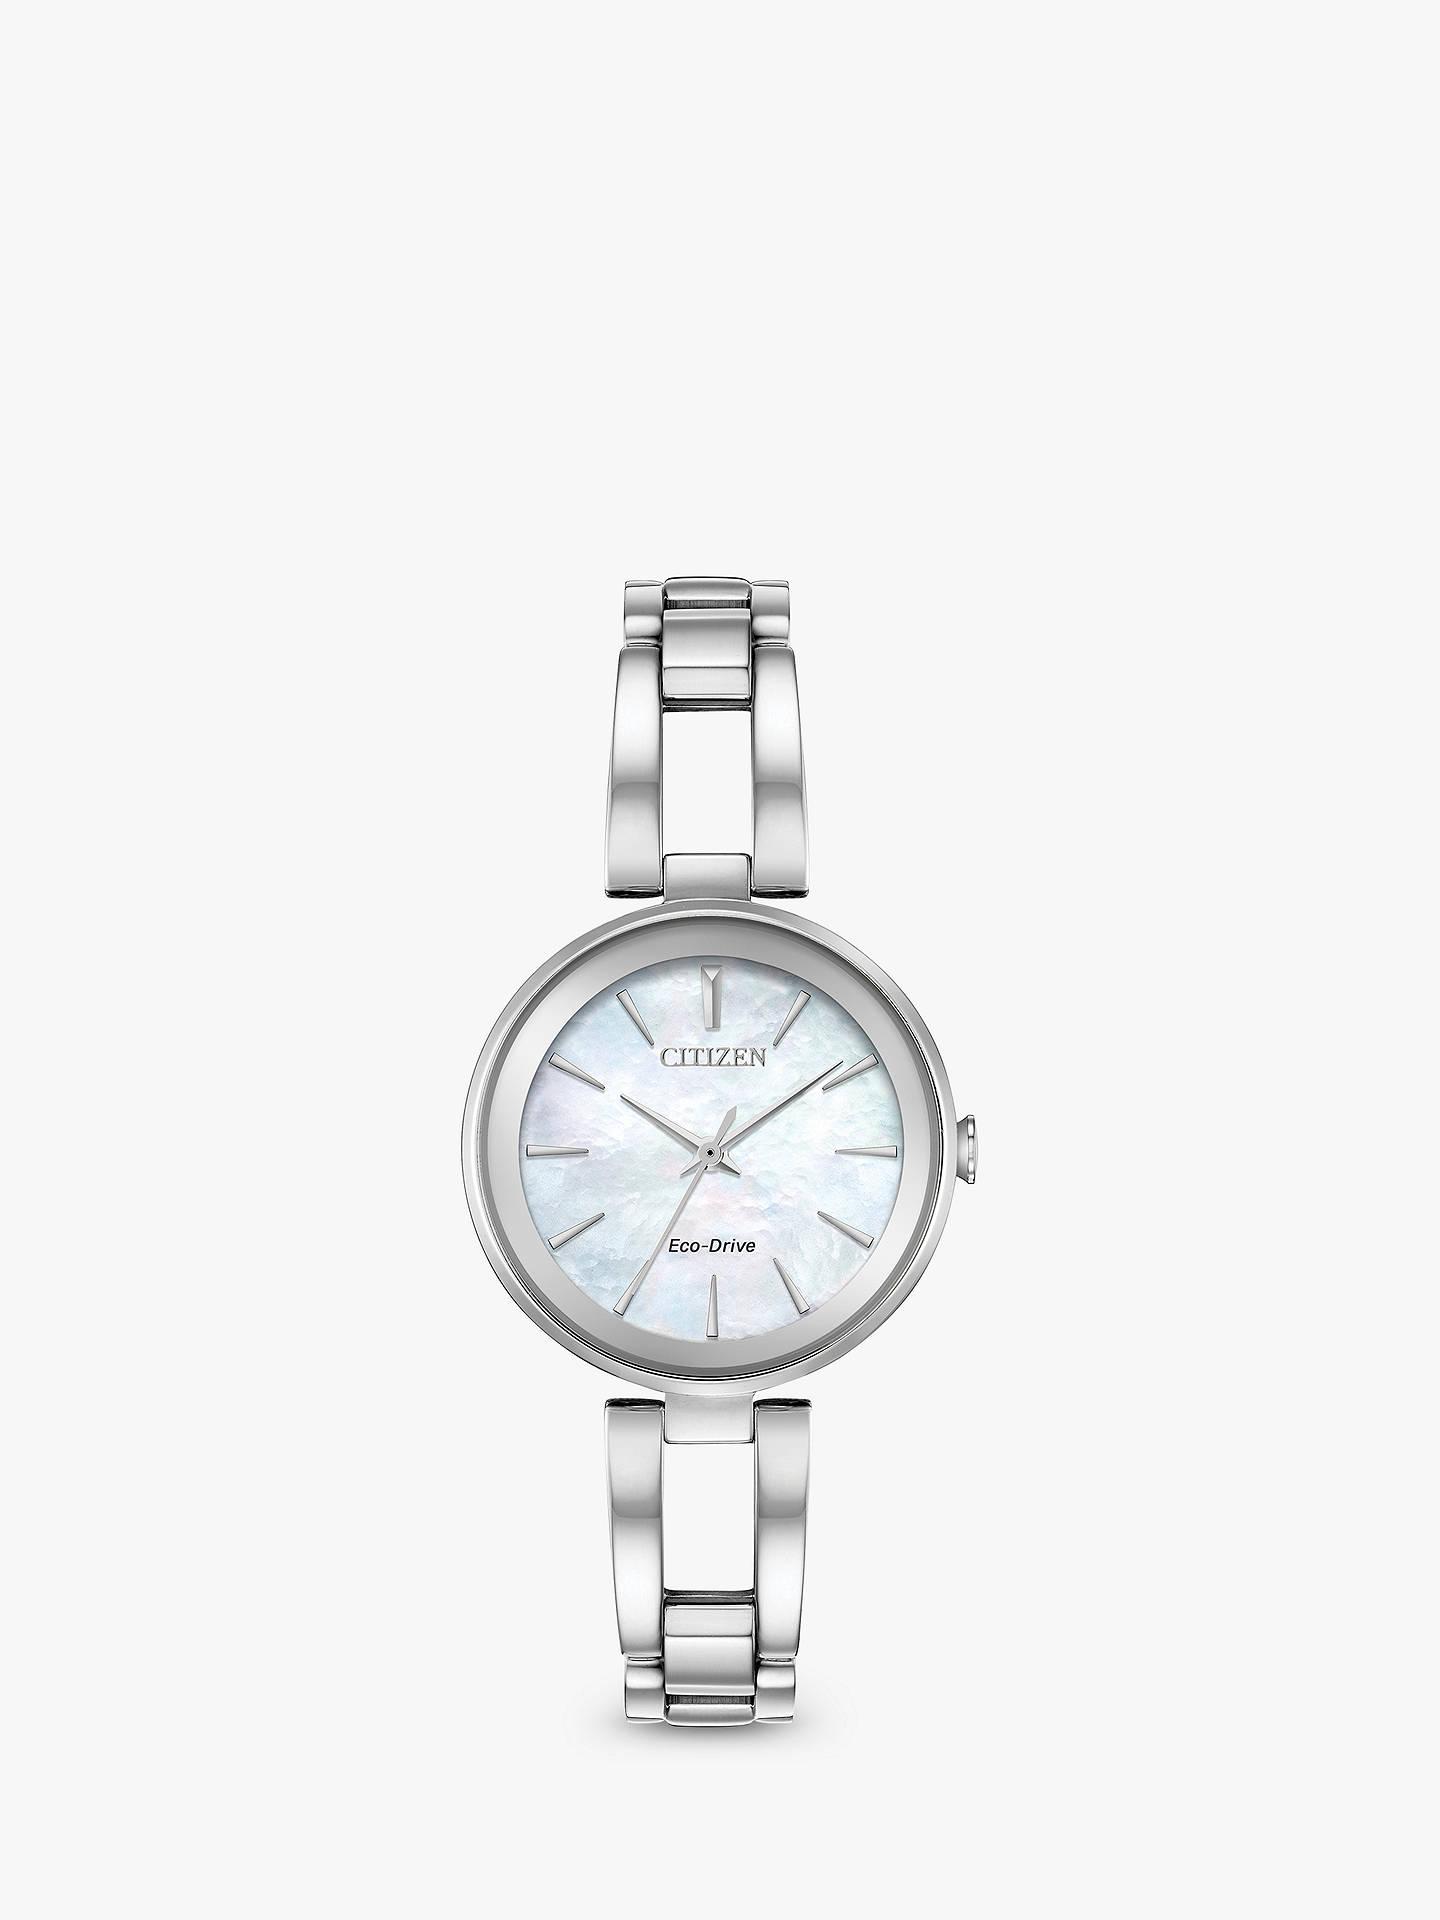 Citizen Women s Axiom Eco-Drive Bracelet Strap Watch at John Lewis ... 03d61876ae